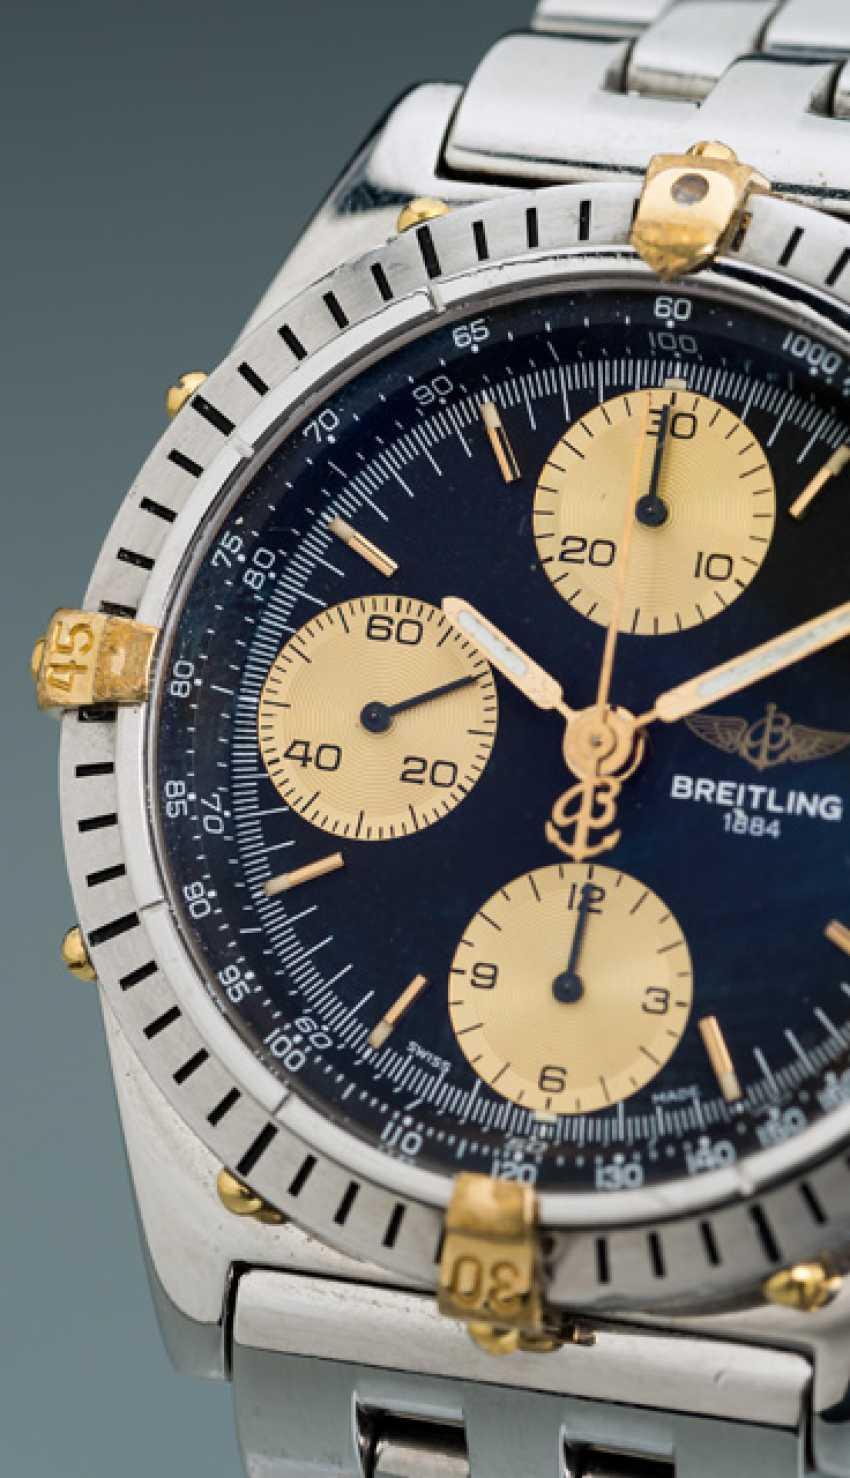 Breitling Chronomat Chronograph, Ref. B13048 - photo 2